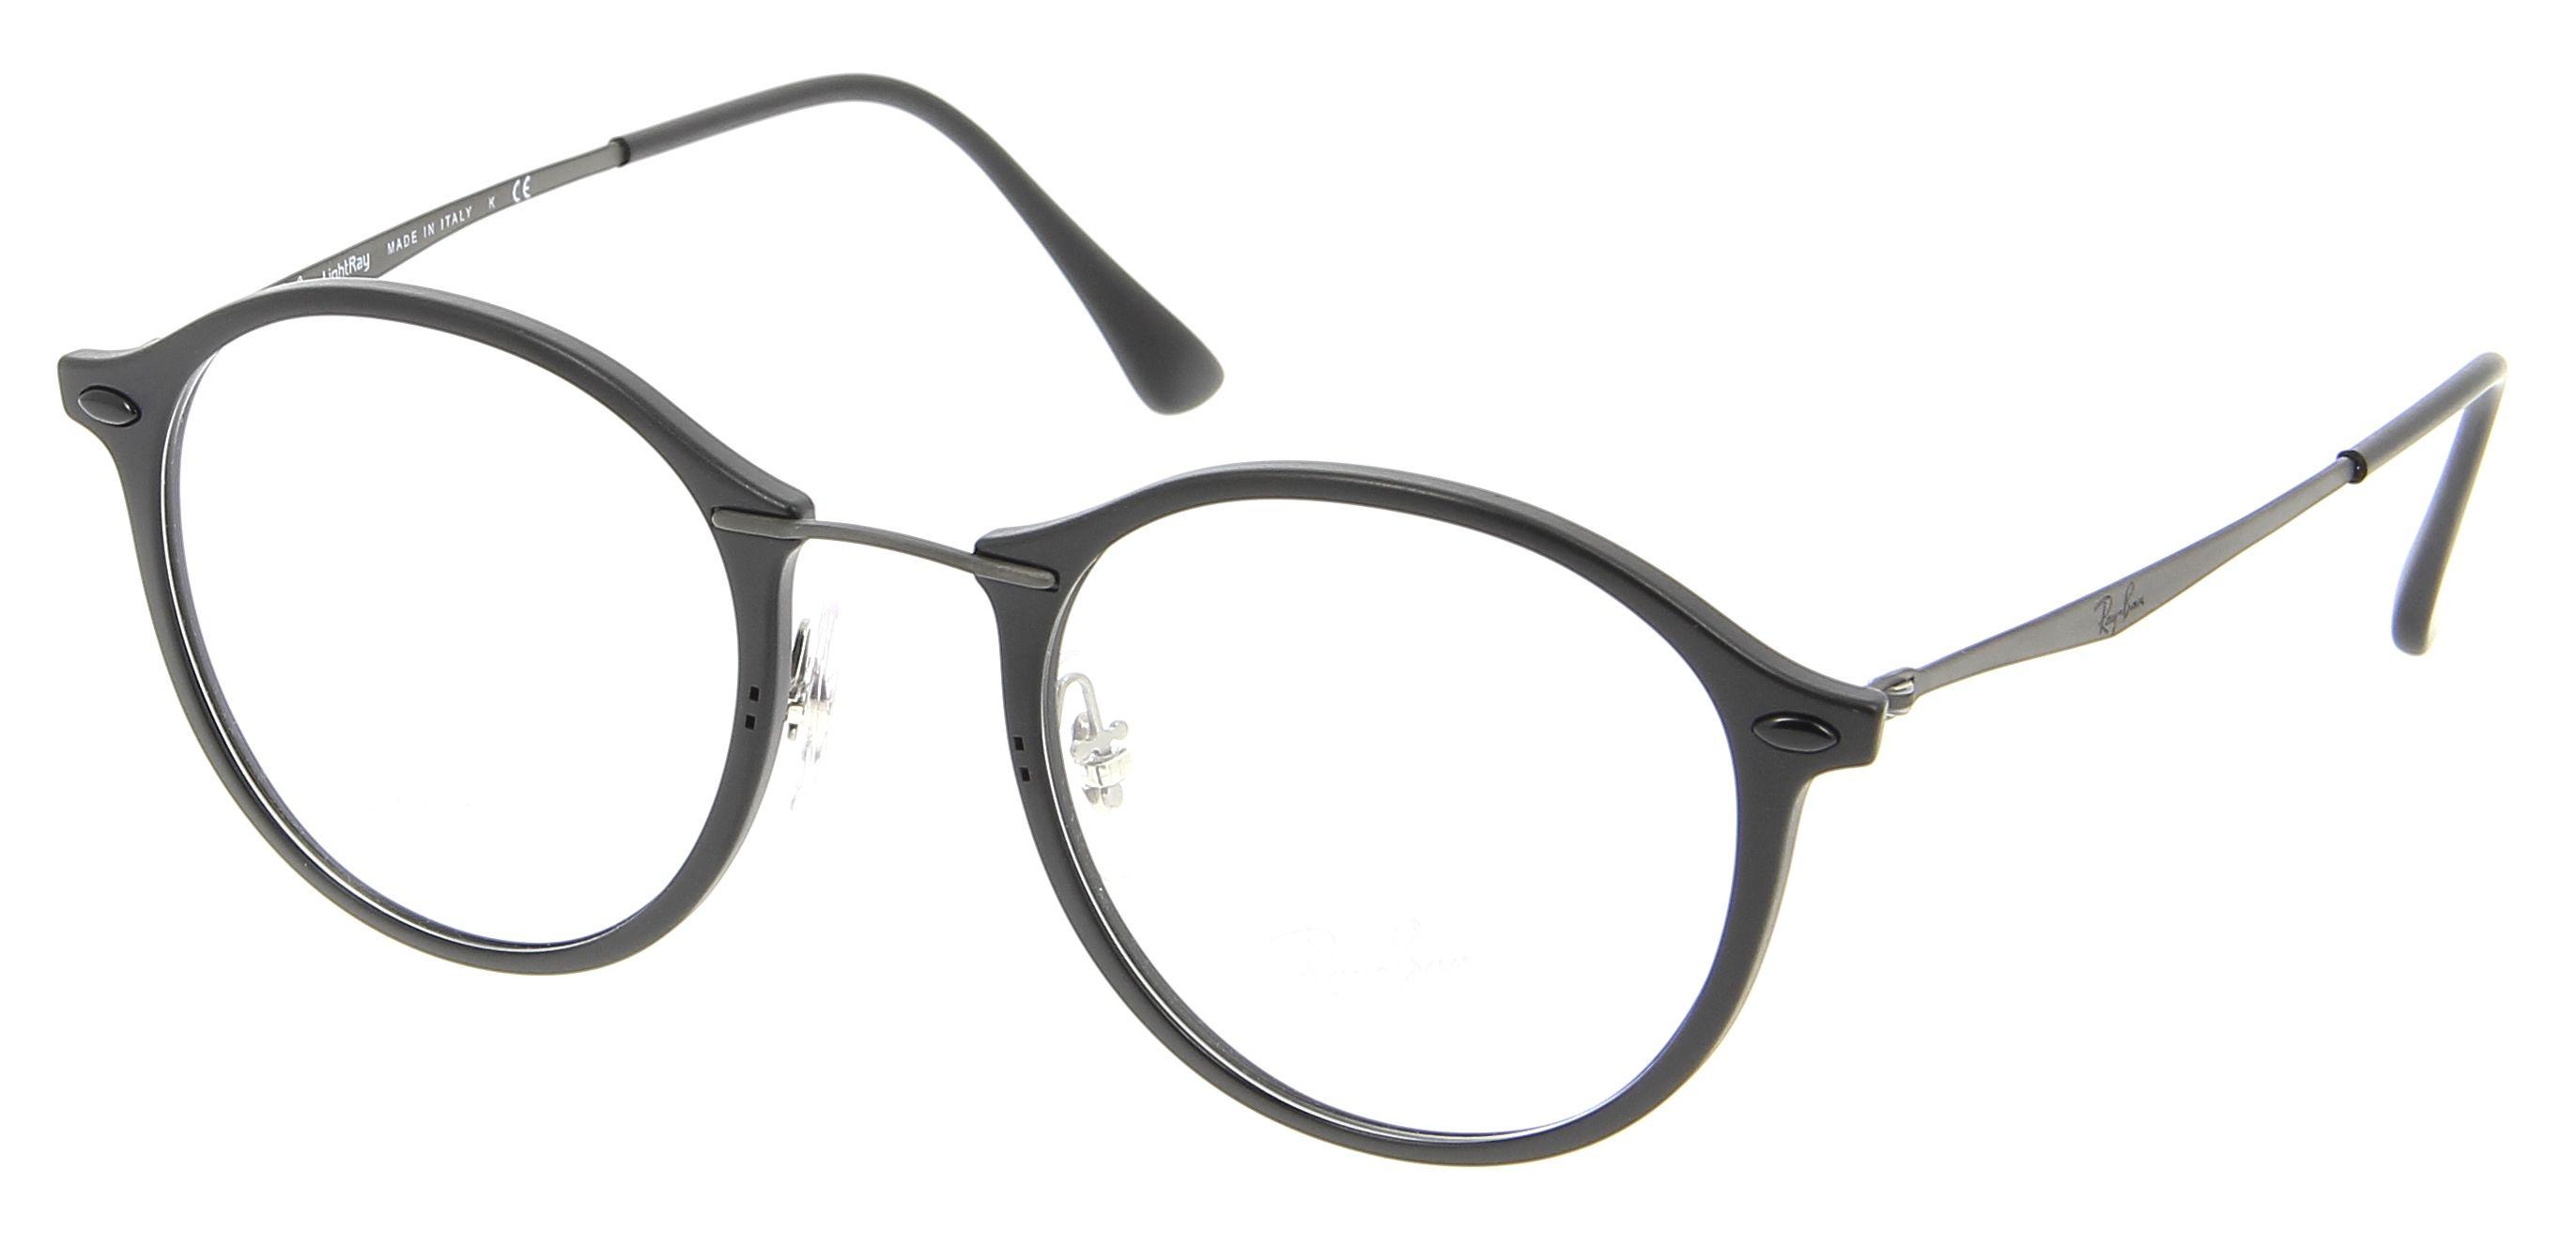 beaa092939 Lunettes de vue 0mmx0mm 0€ in 2019 | Gafas | Gafas, Lentes, Ropa